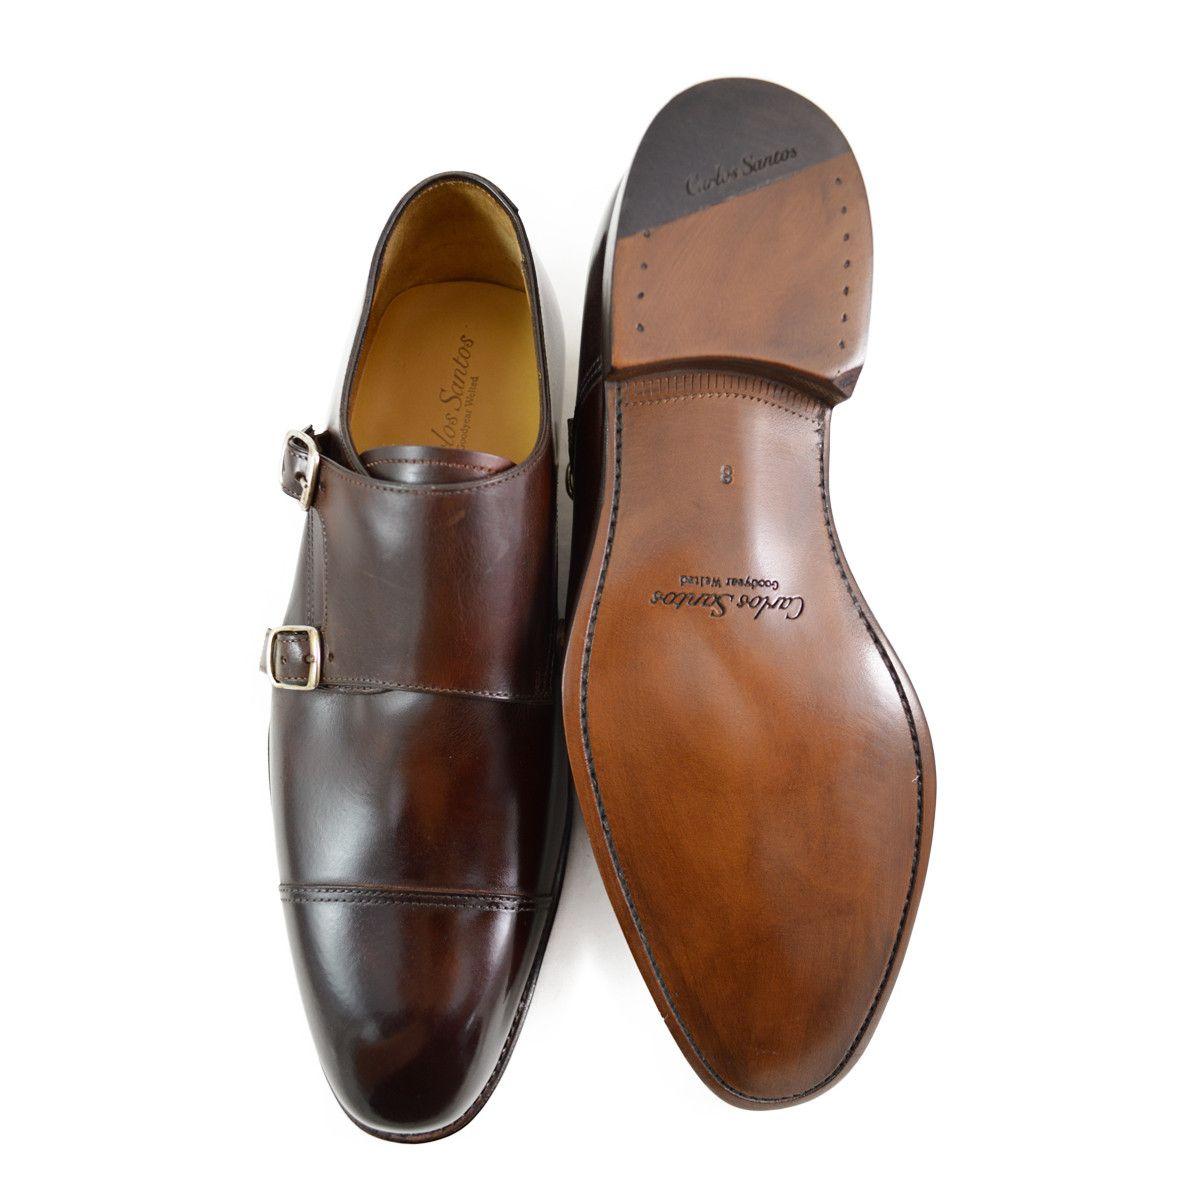 högmode bli billig bästa pris Carlos Santos Double Monk - Guimaraes | Shoes, Goodyear welt, Calf ...